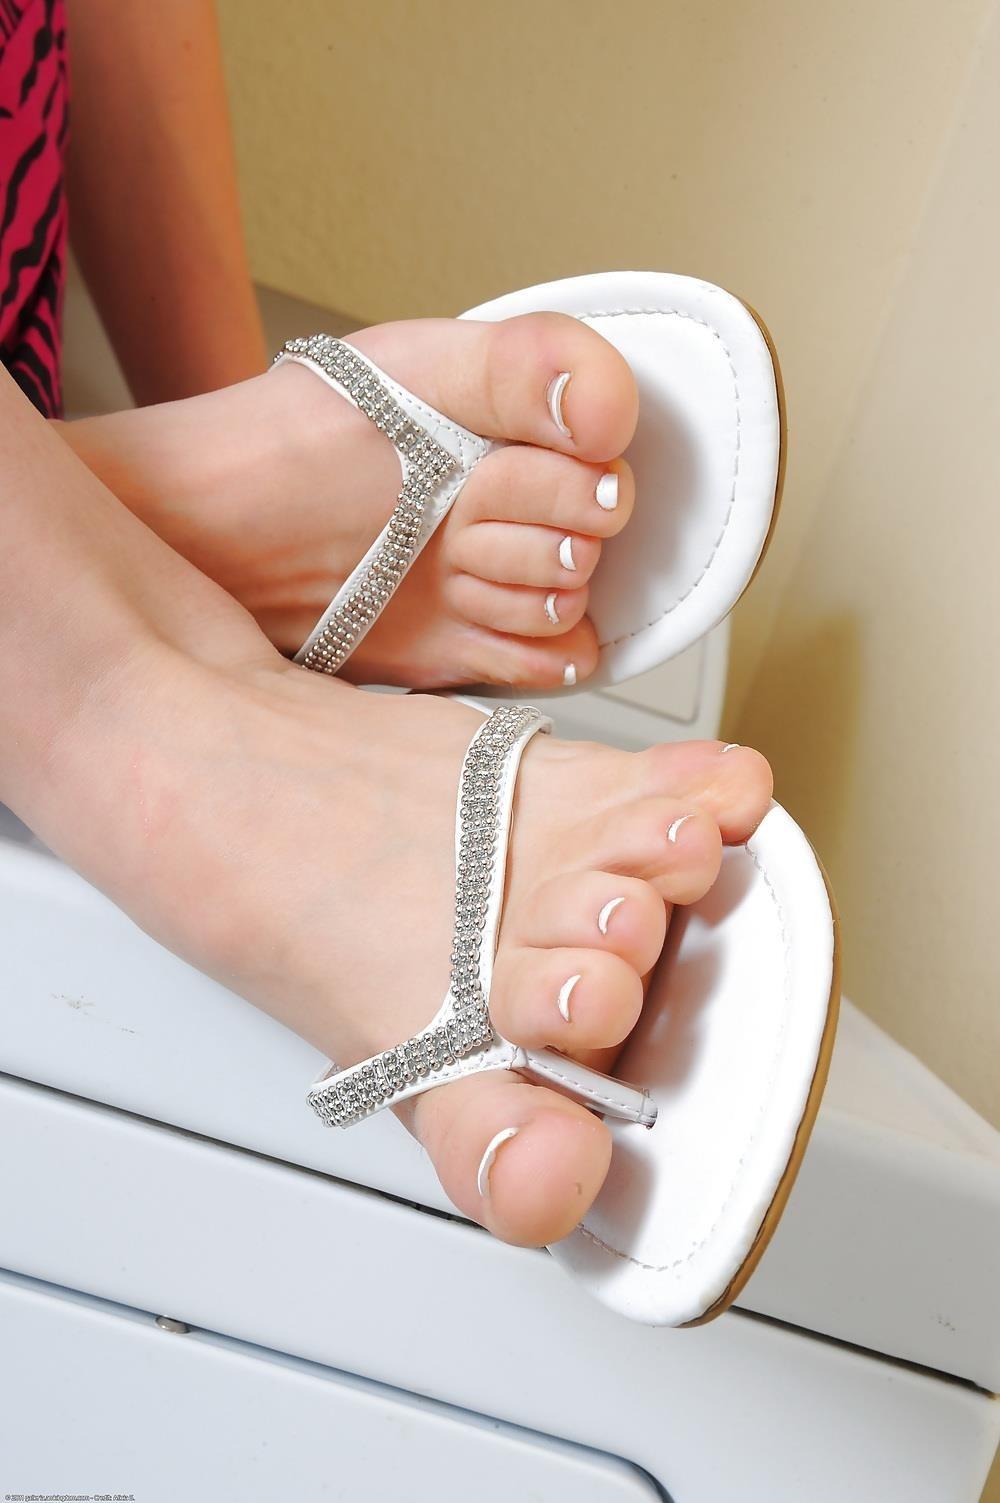 Young porn feet-3156